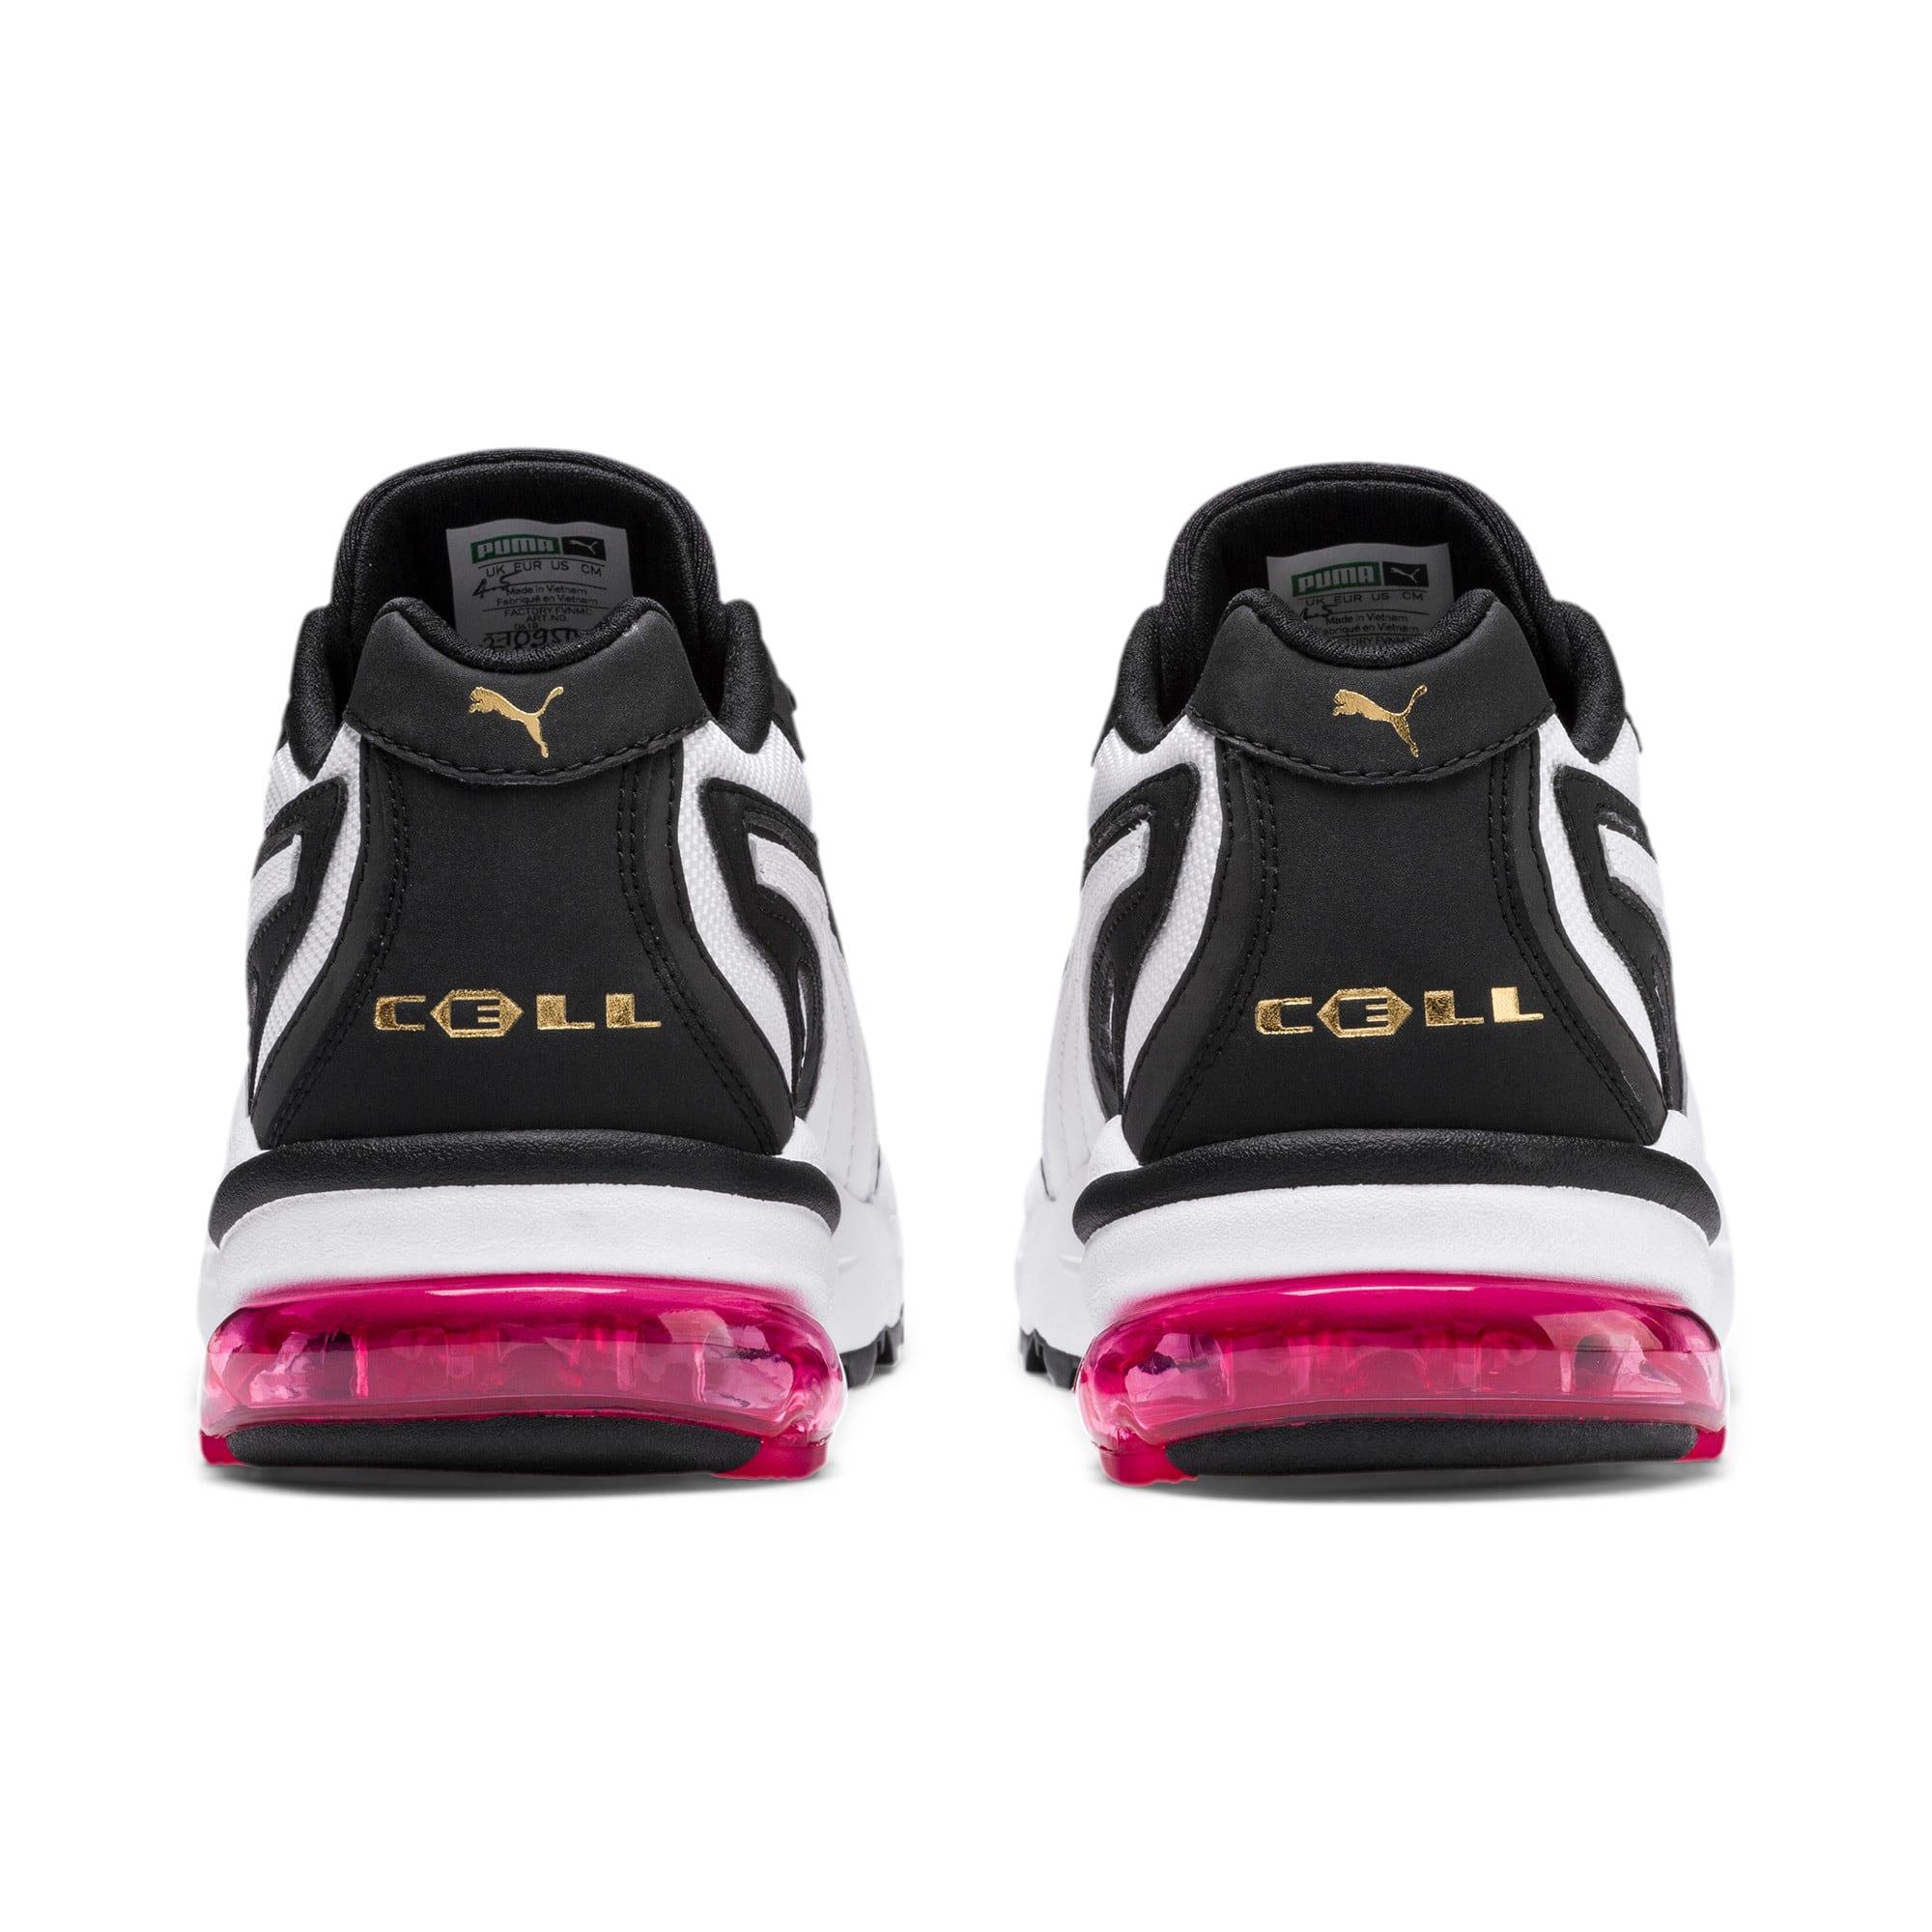 Thumbnail 3 of CELL Stellar Damen Sneaker, Puma White-Puma Black, medium